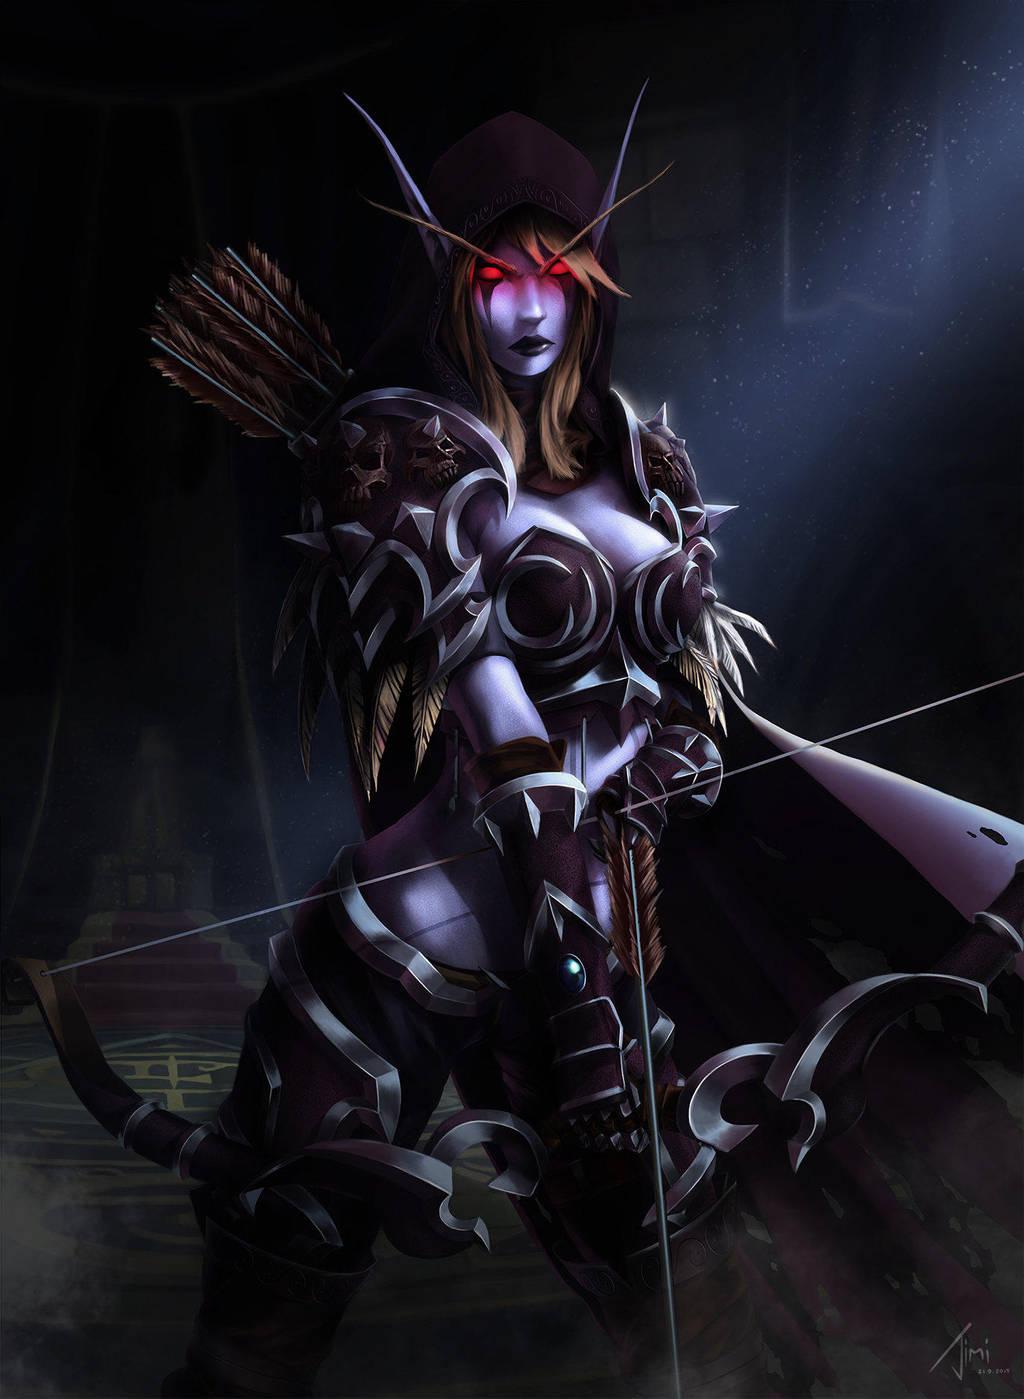 Sylvanas Windrunner, The Dark Lady by Maltheras on DeviantArt